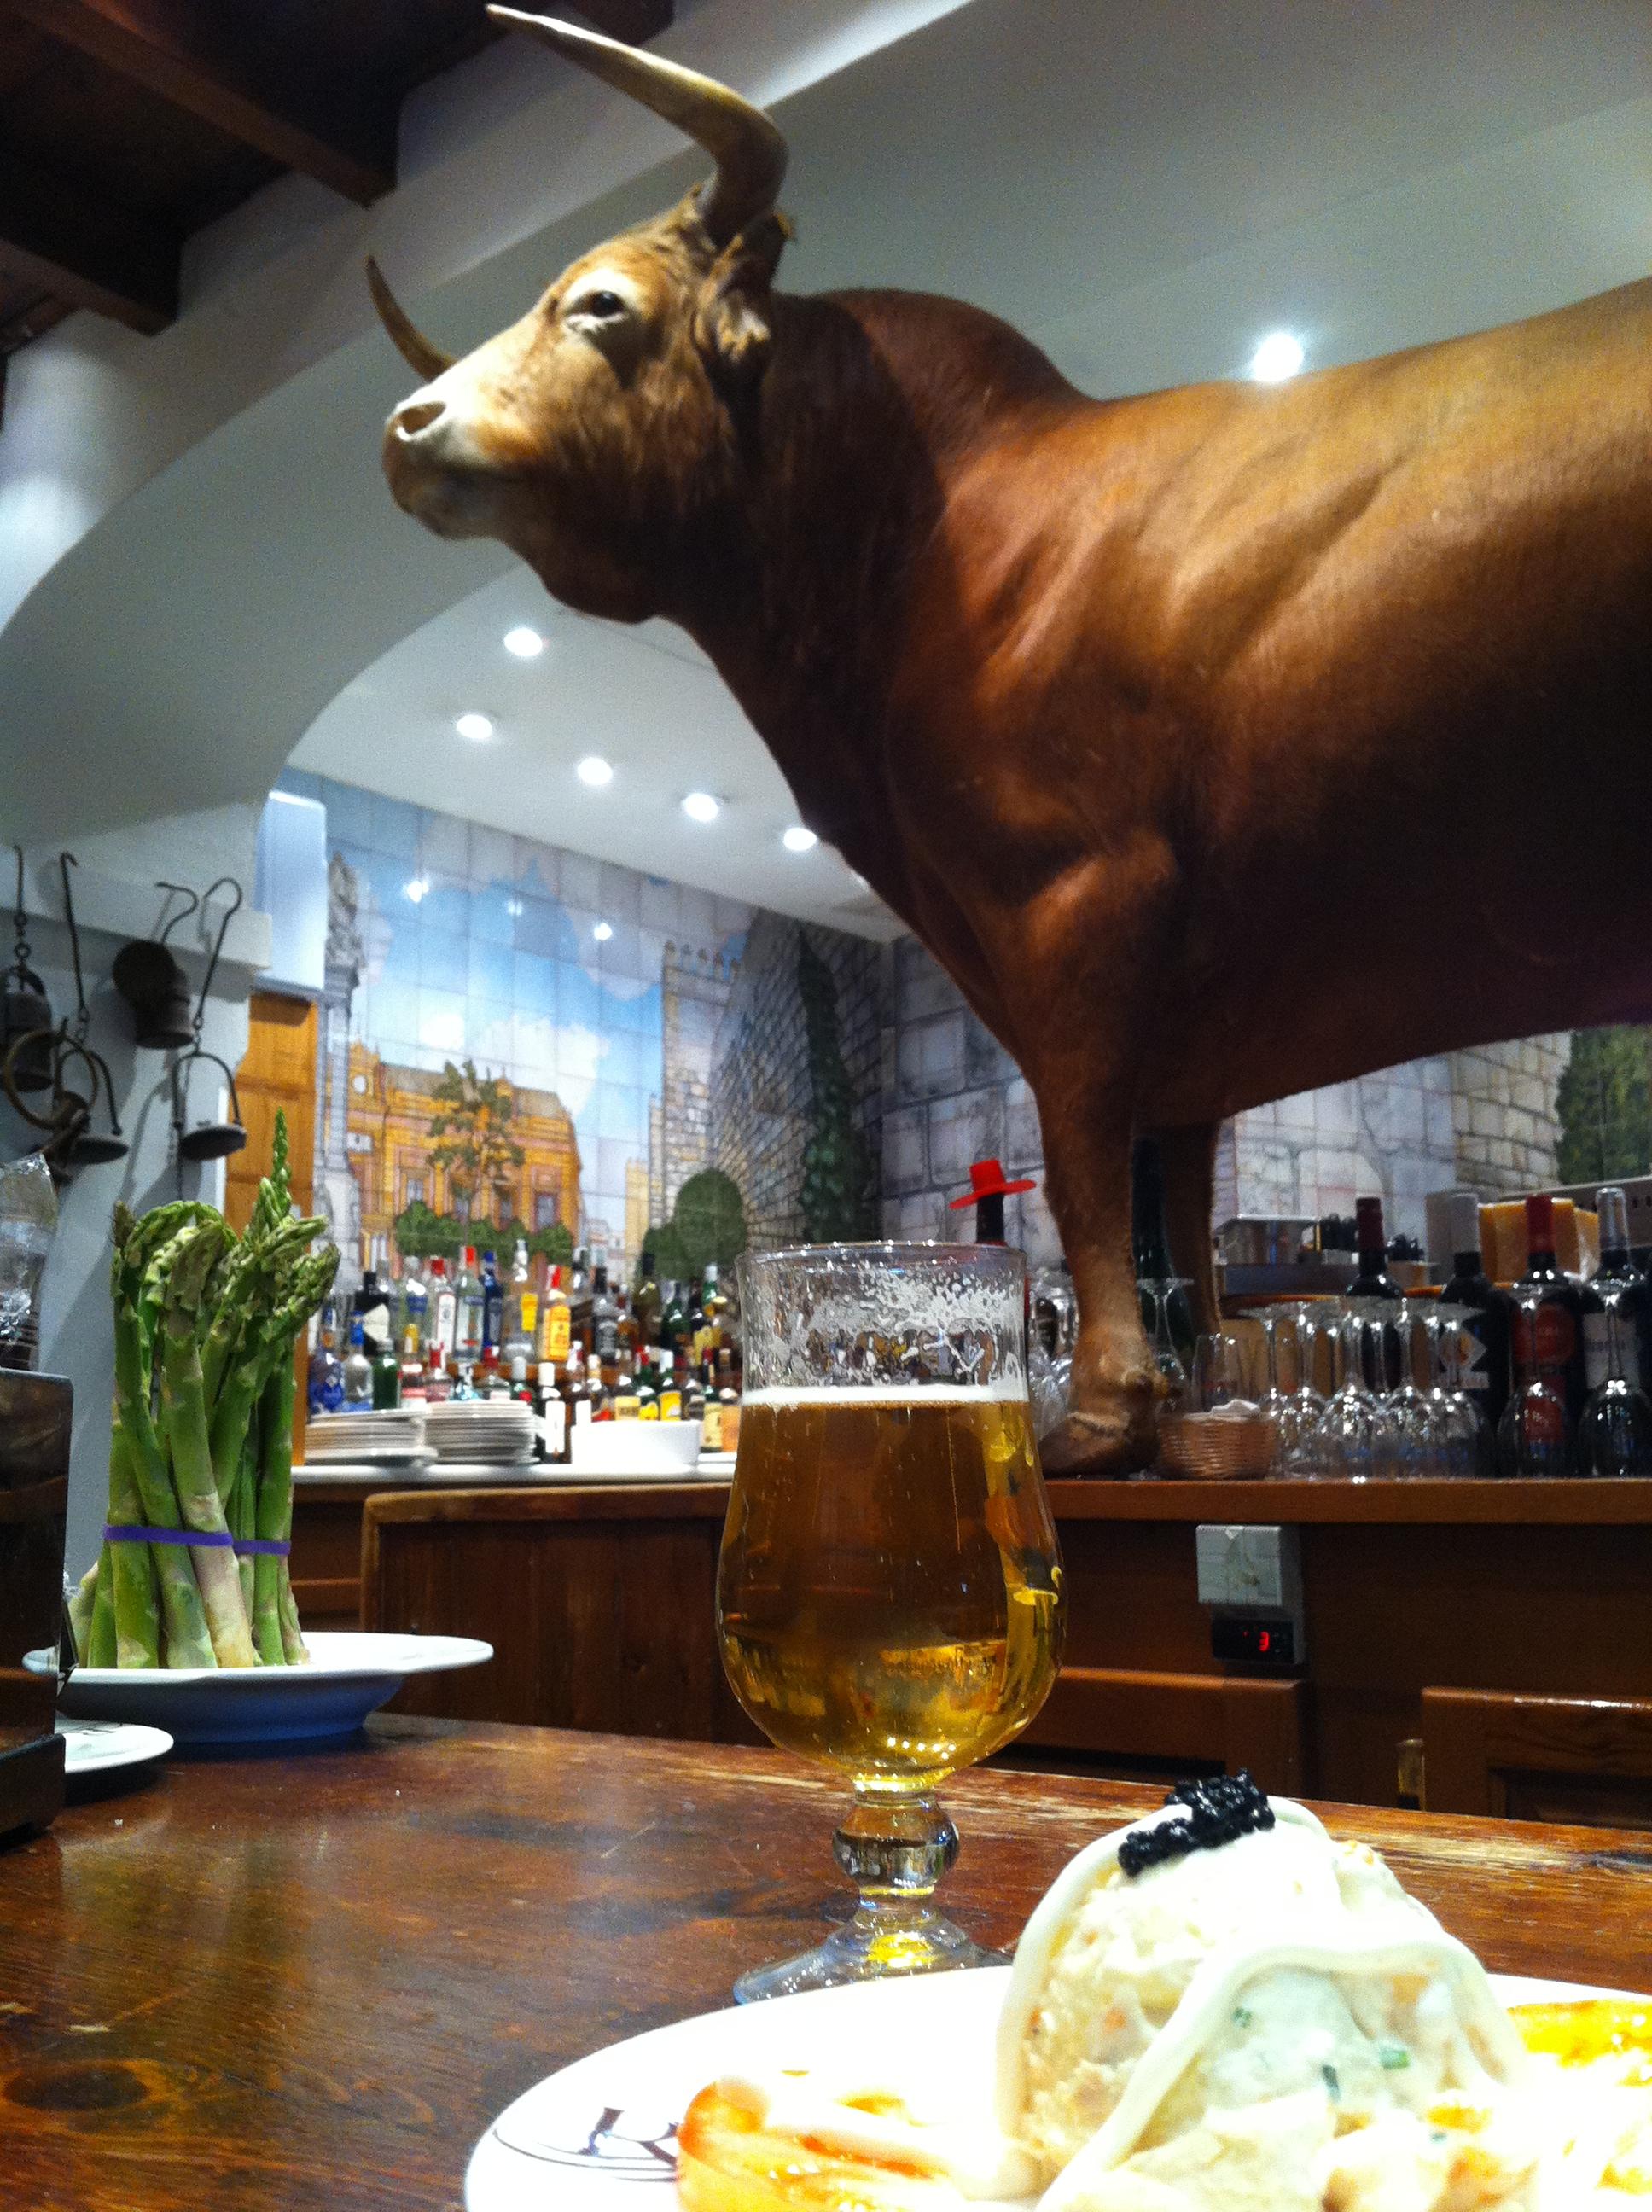 Bar Tapas Robles Seville